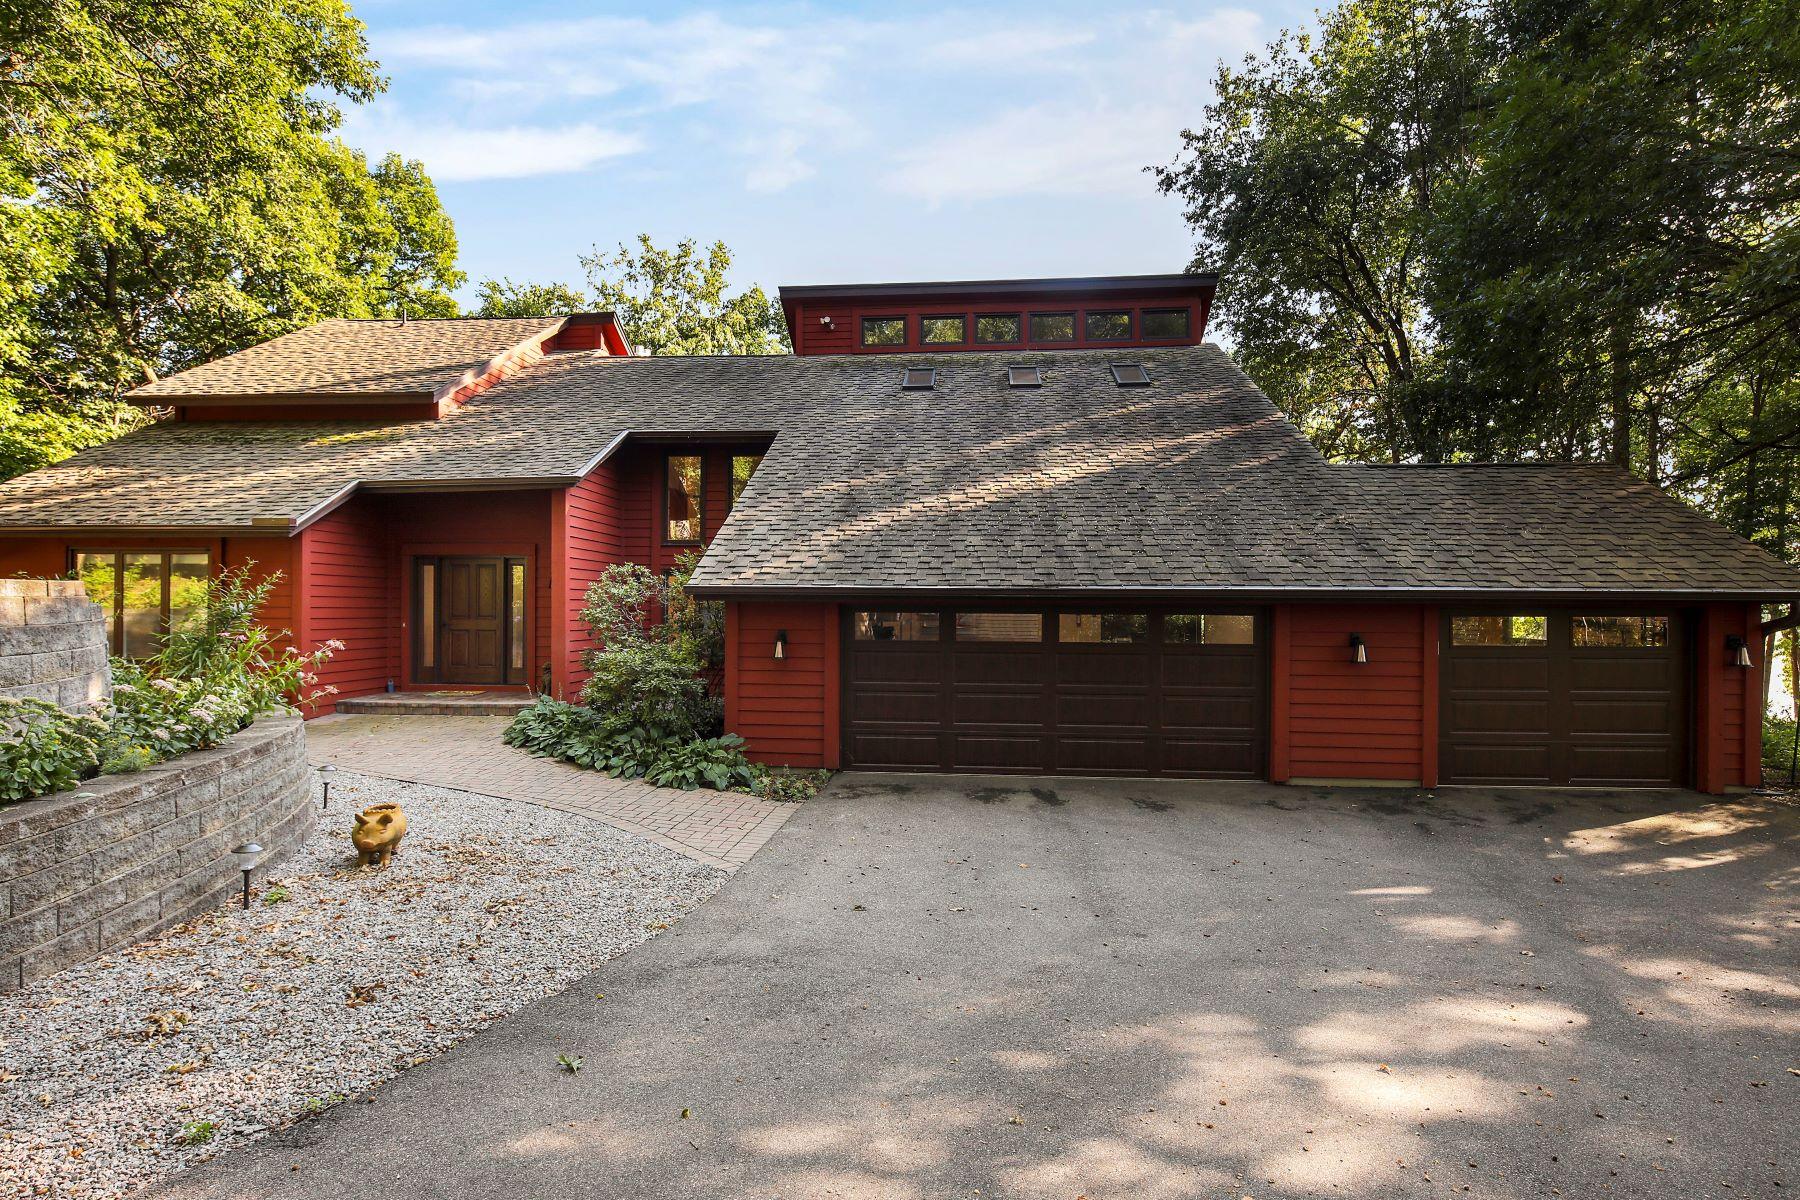 Single Family Homes for Sale at 1 Black Oak Road North Oaks, Minnesota 55127 United States